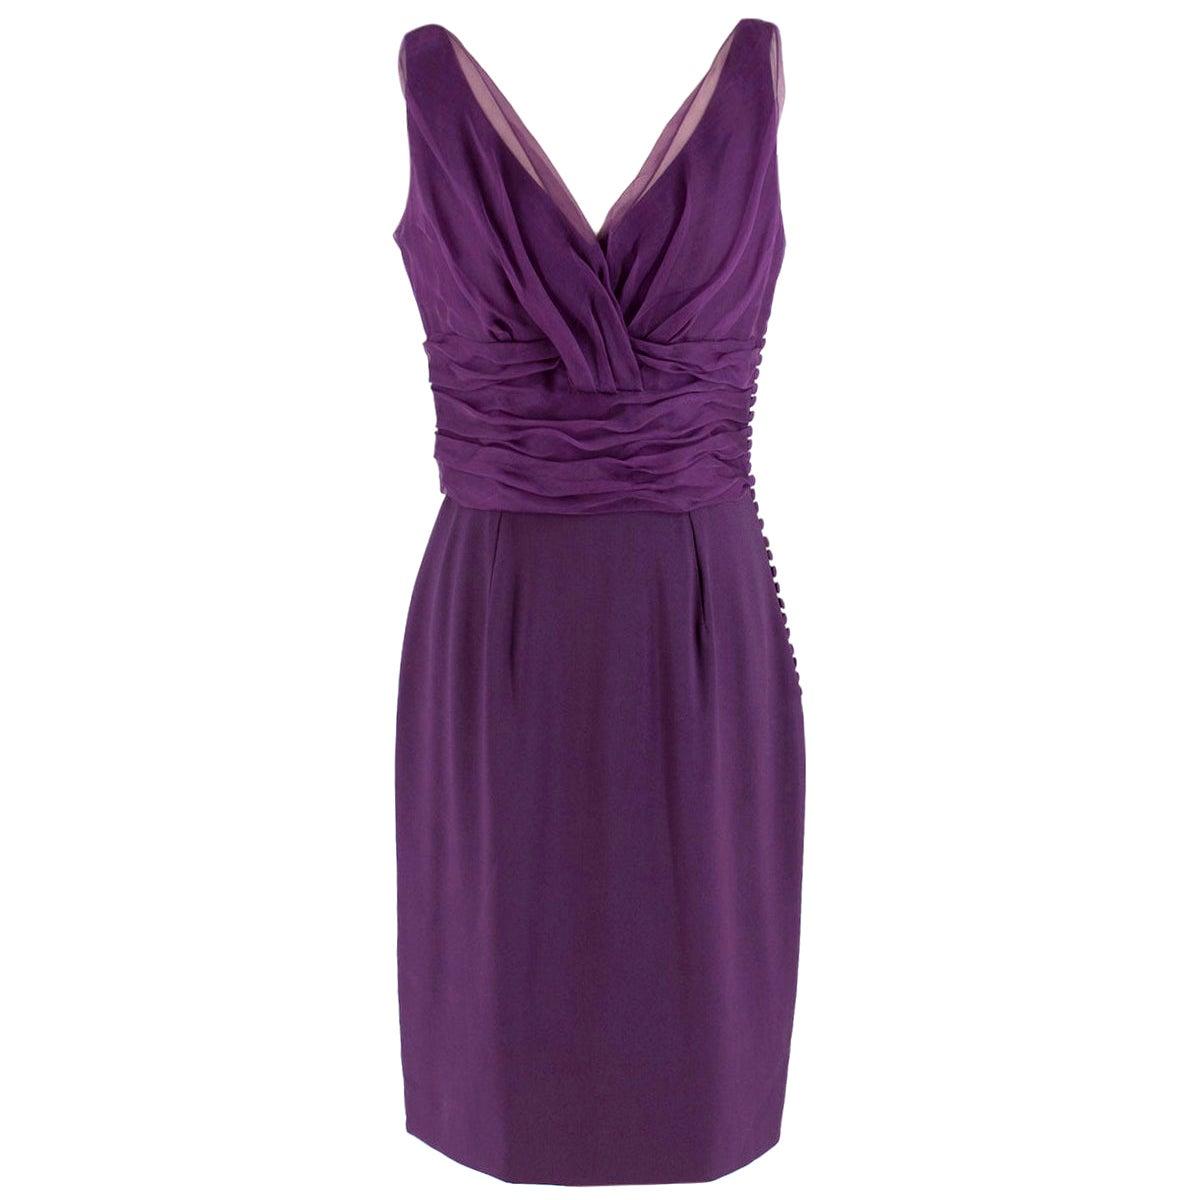 Christian Dior Purple Pleated Draped Dress - Size US 8